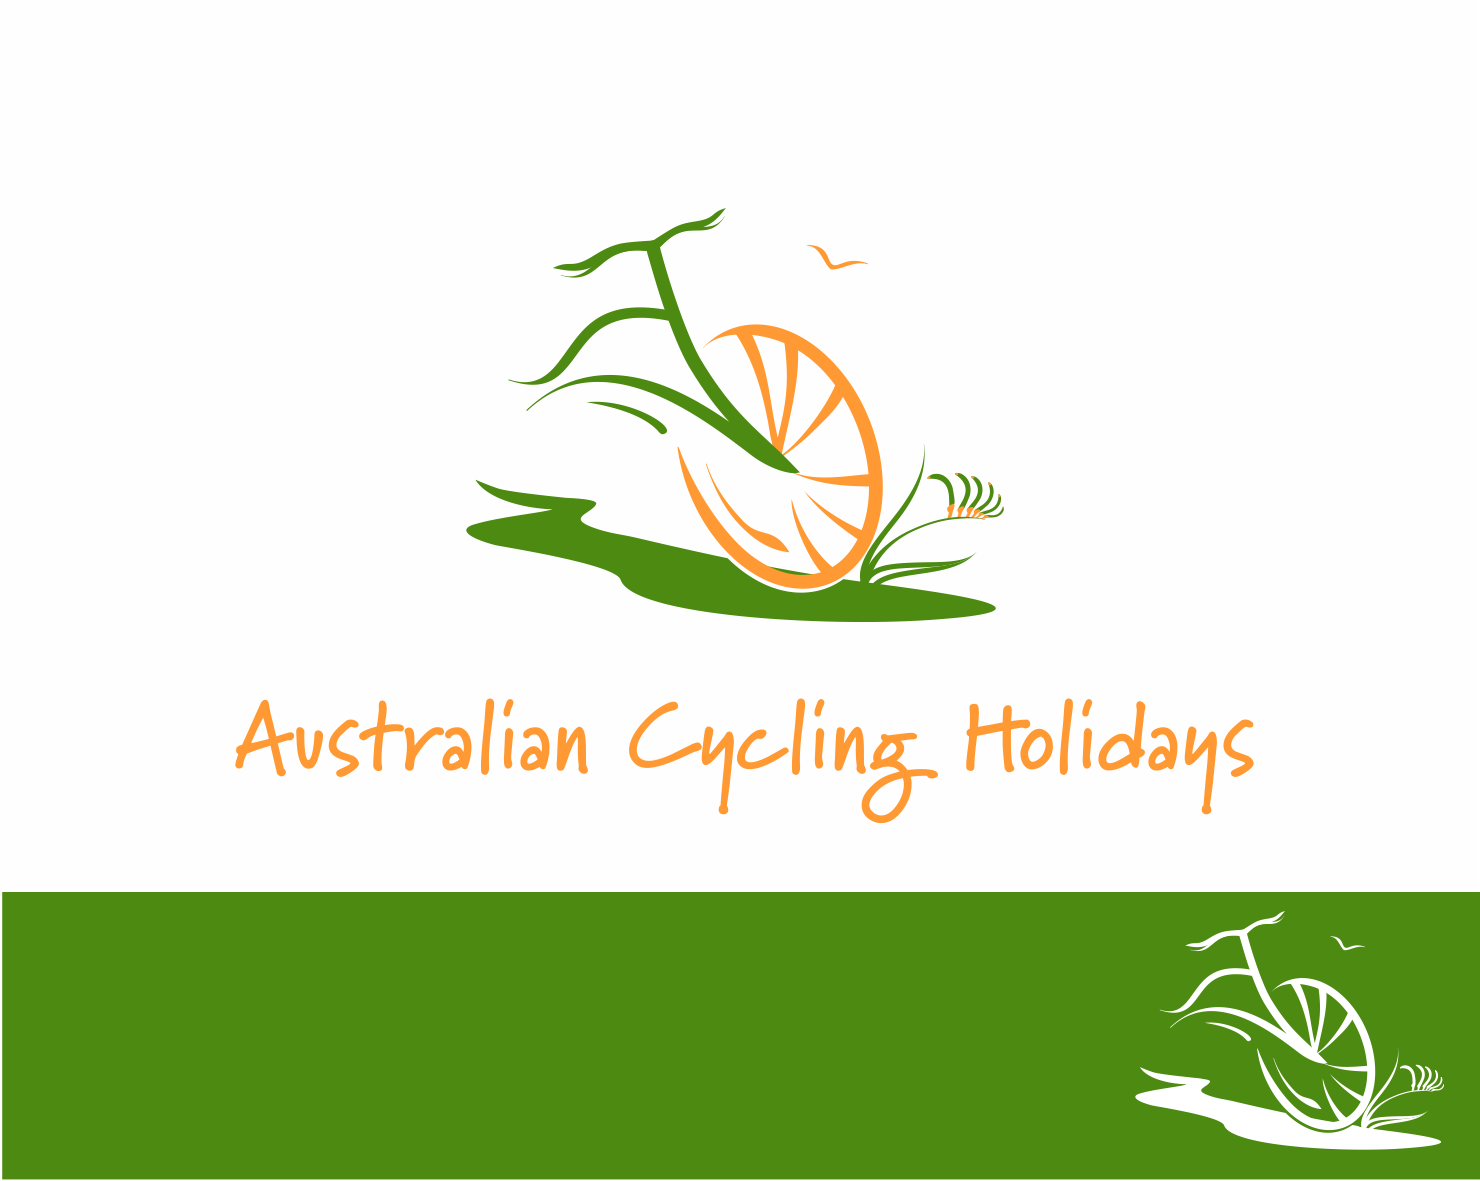 Australian Cycling Holidays needs a logo!